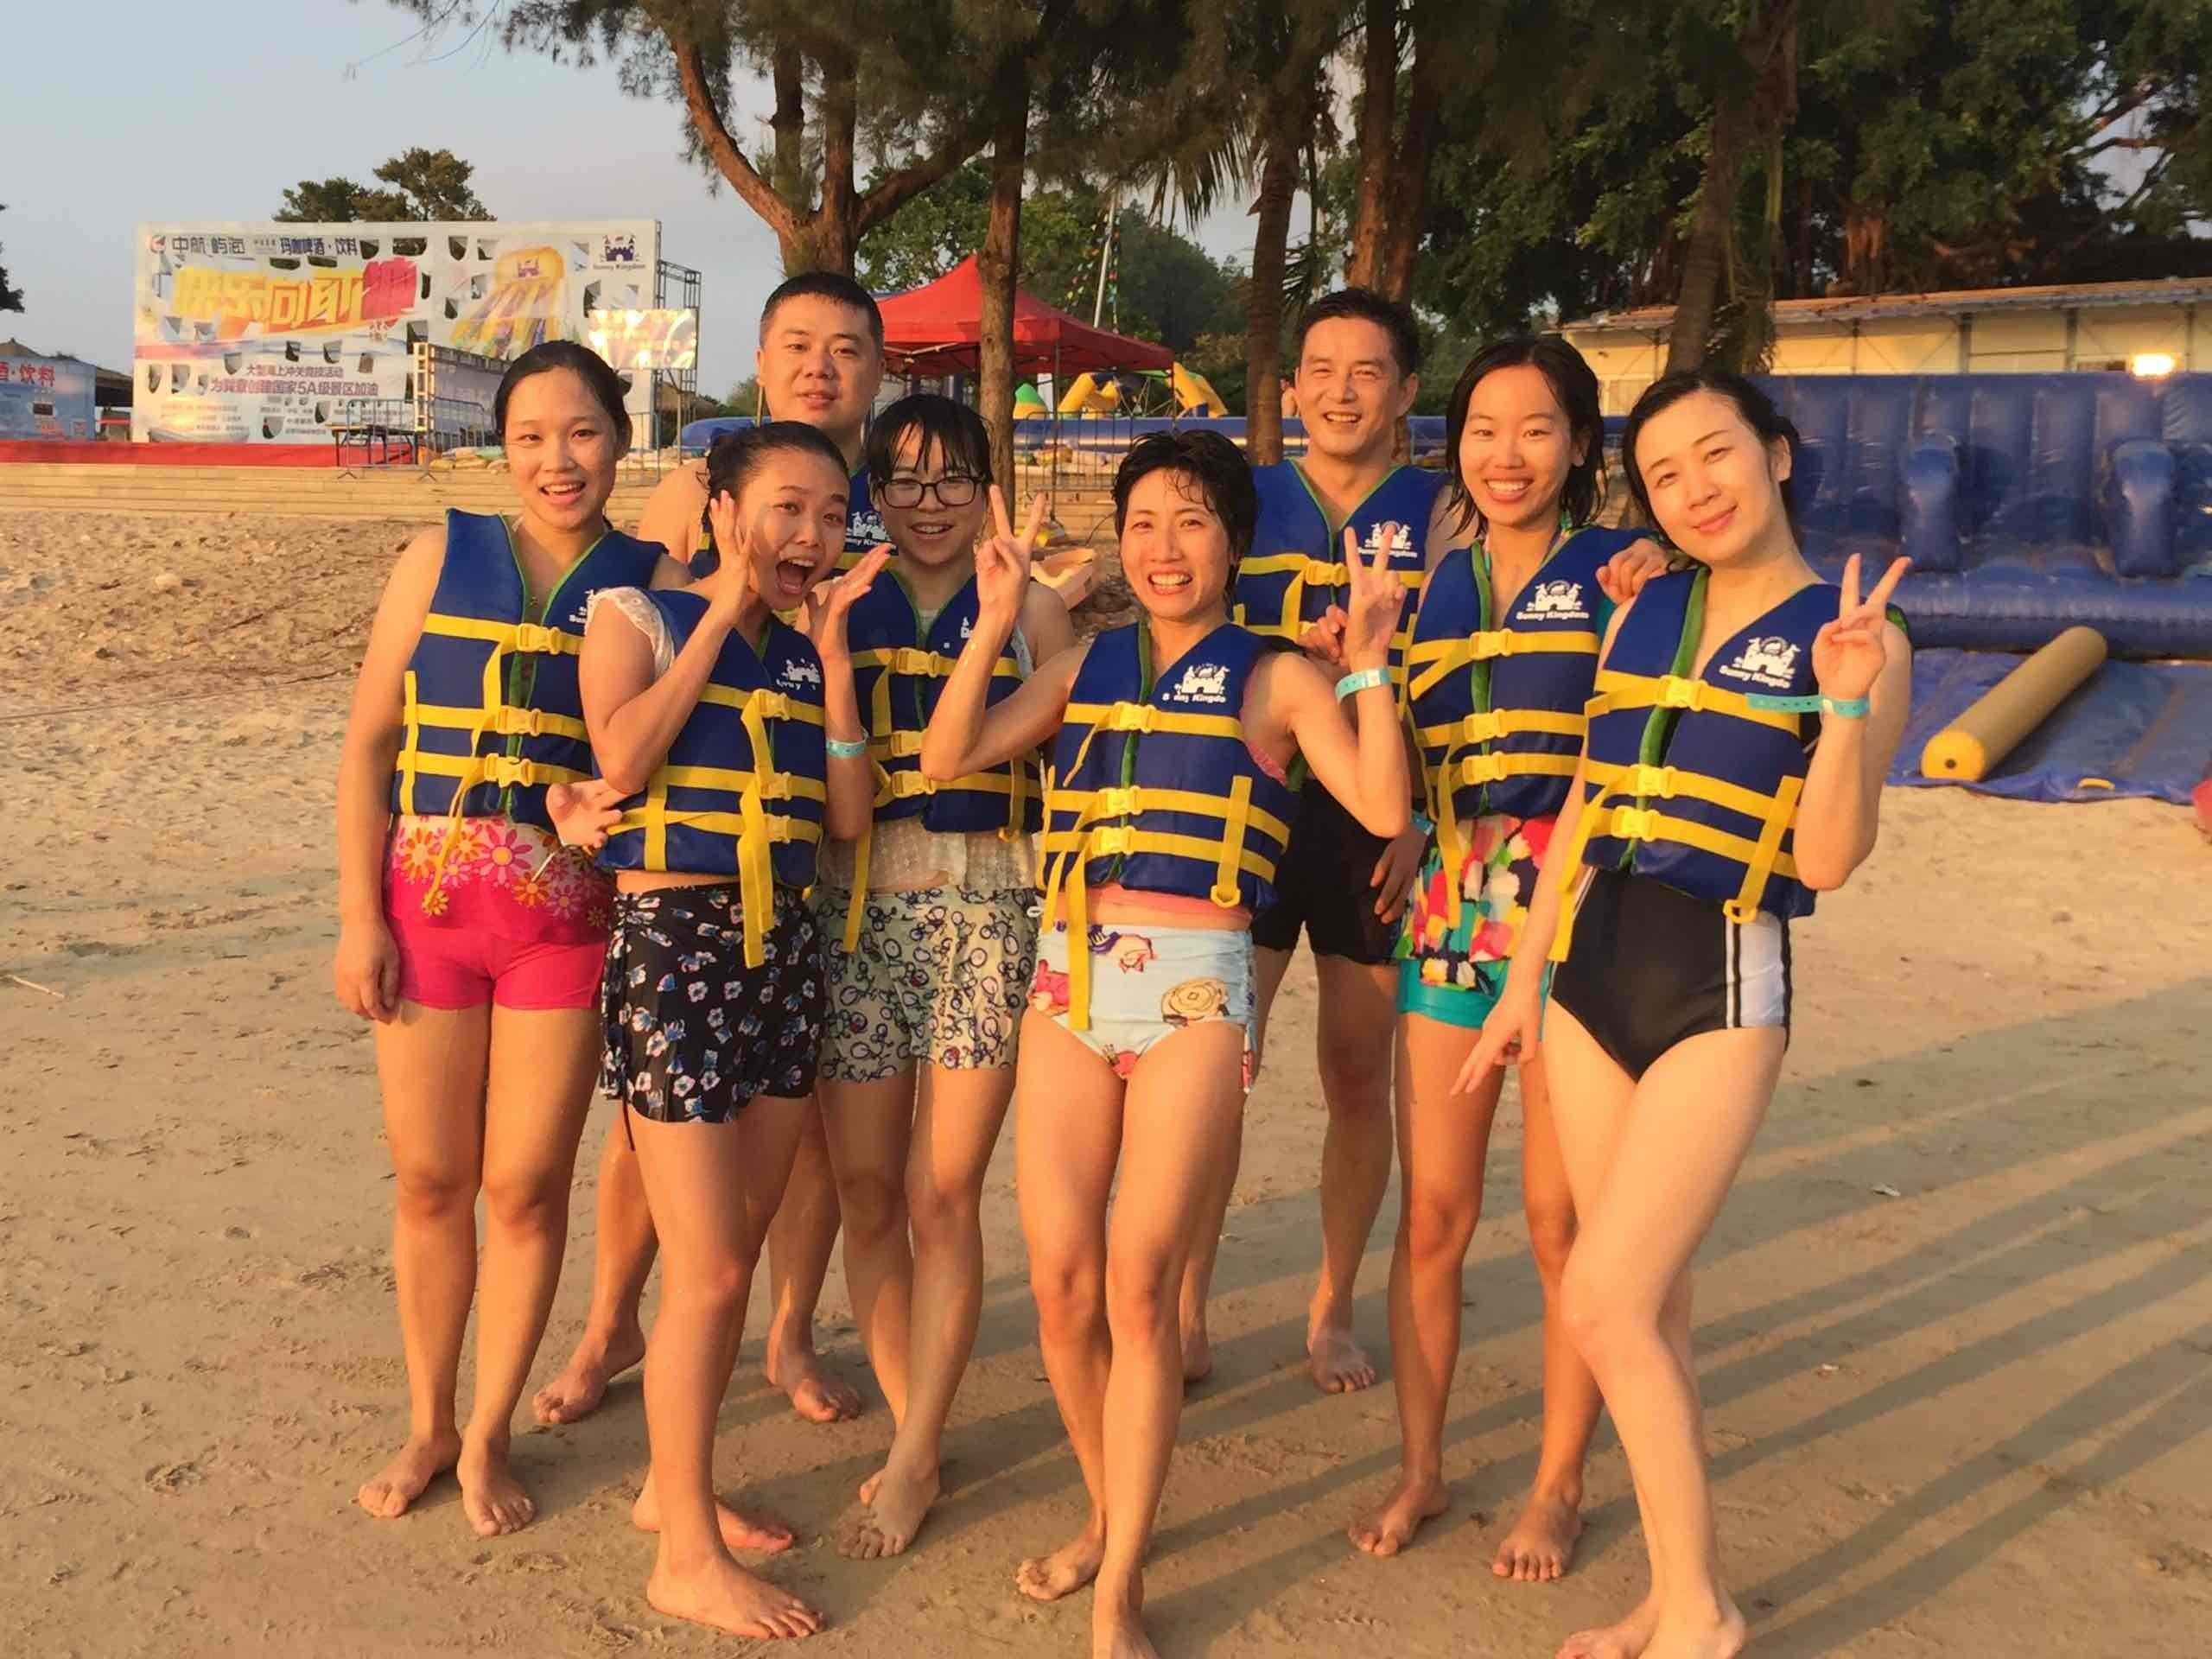 Bouncia -Team Building In a Sea Park | News On Bouncia Inflatables